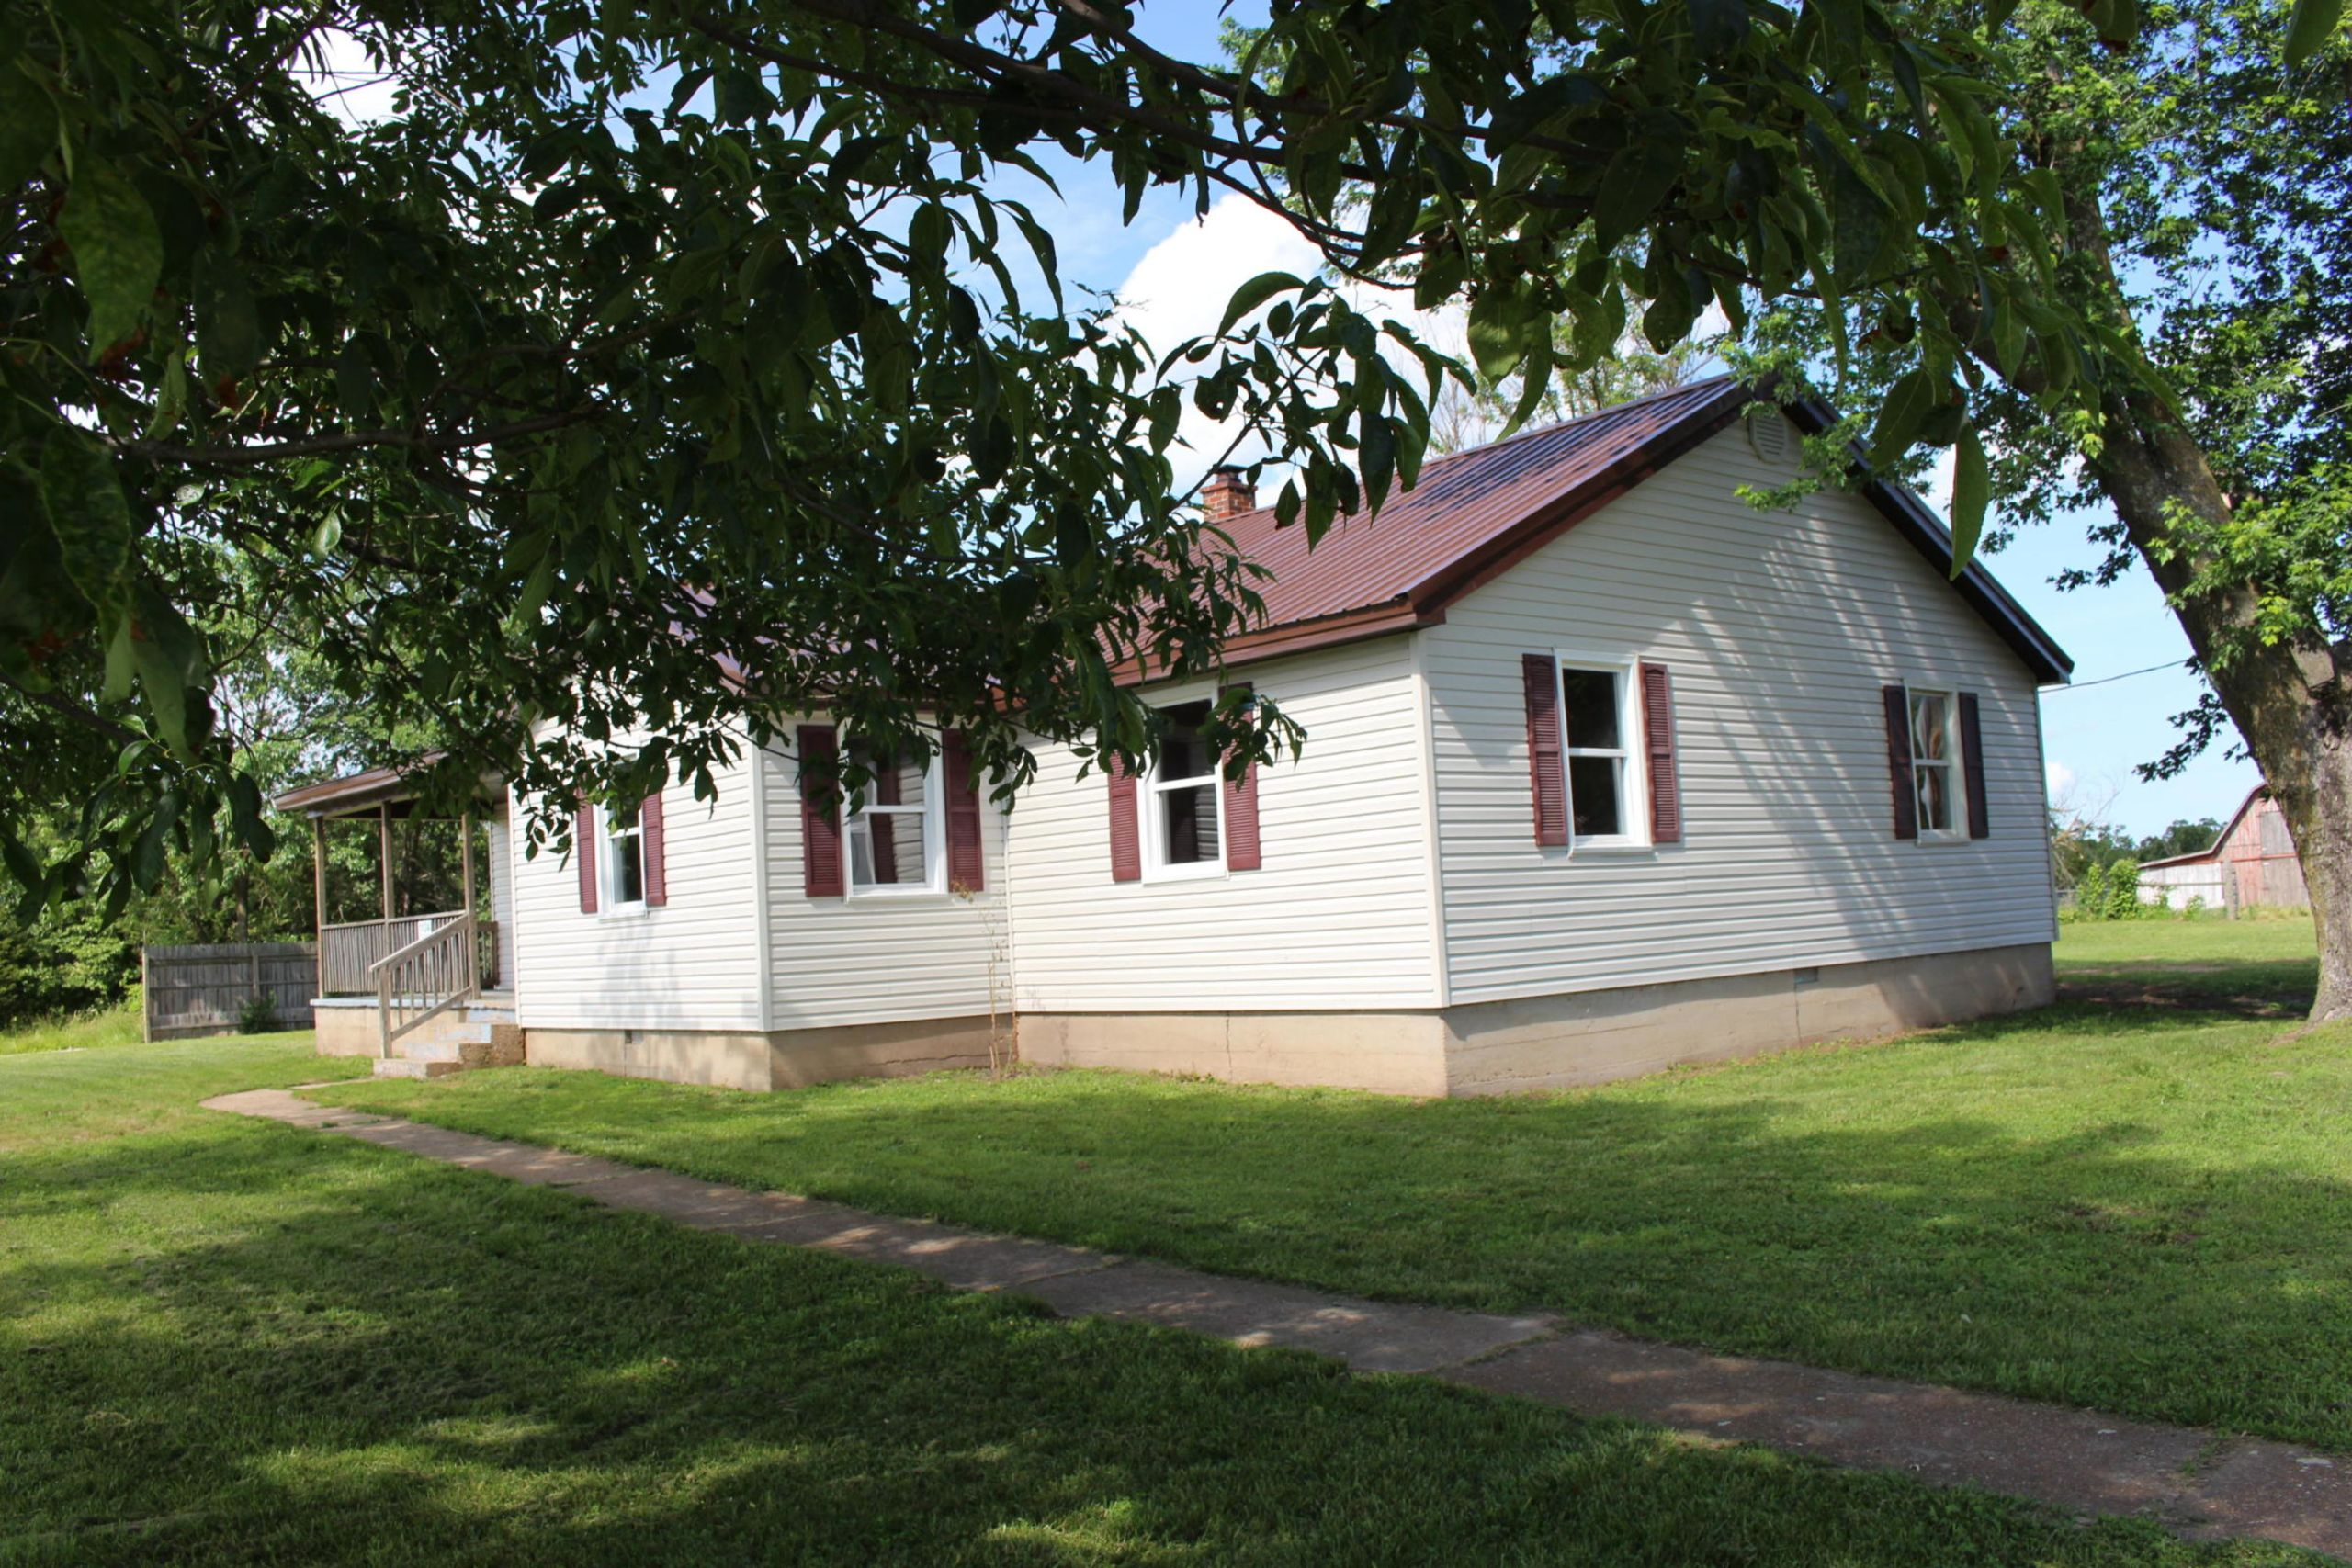 Buffalo Mo homes for sale